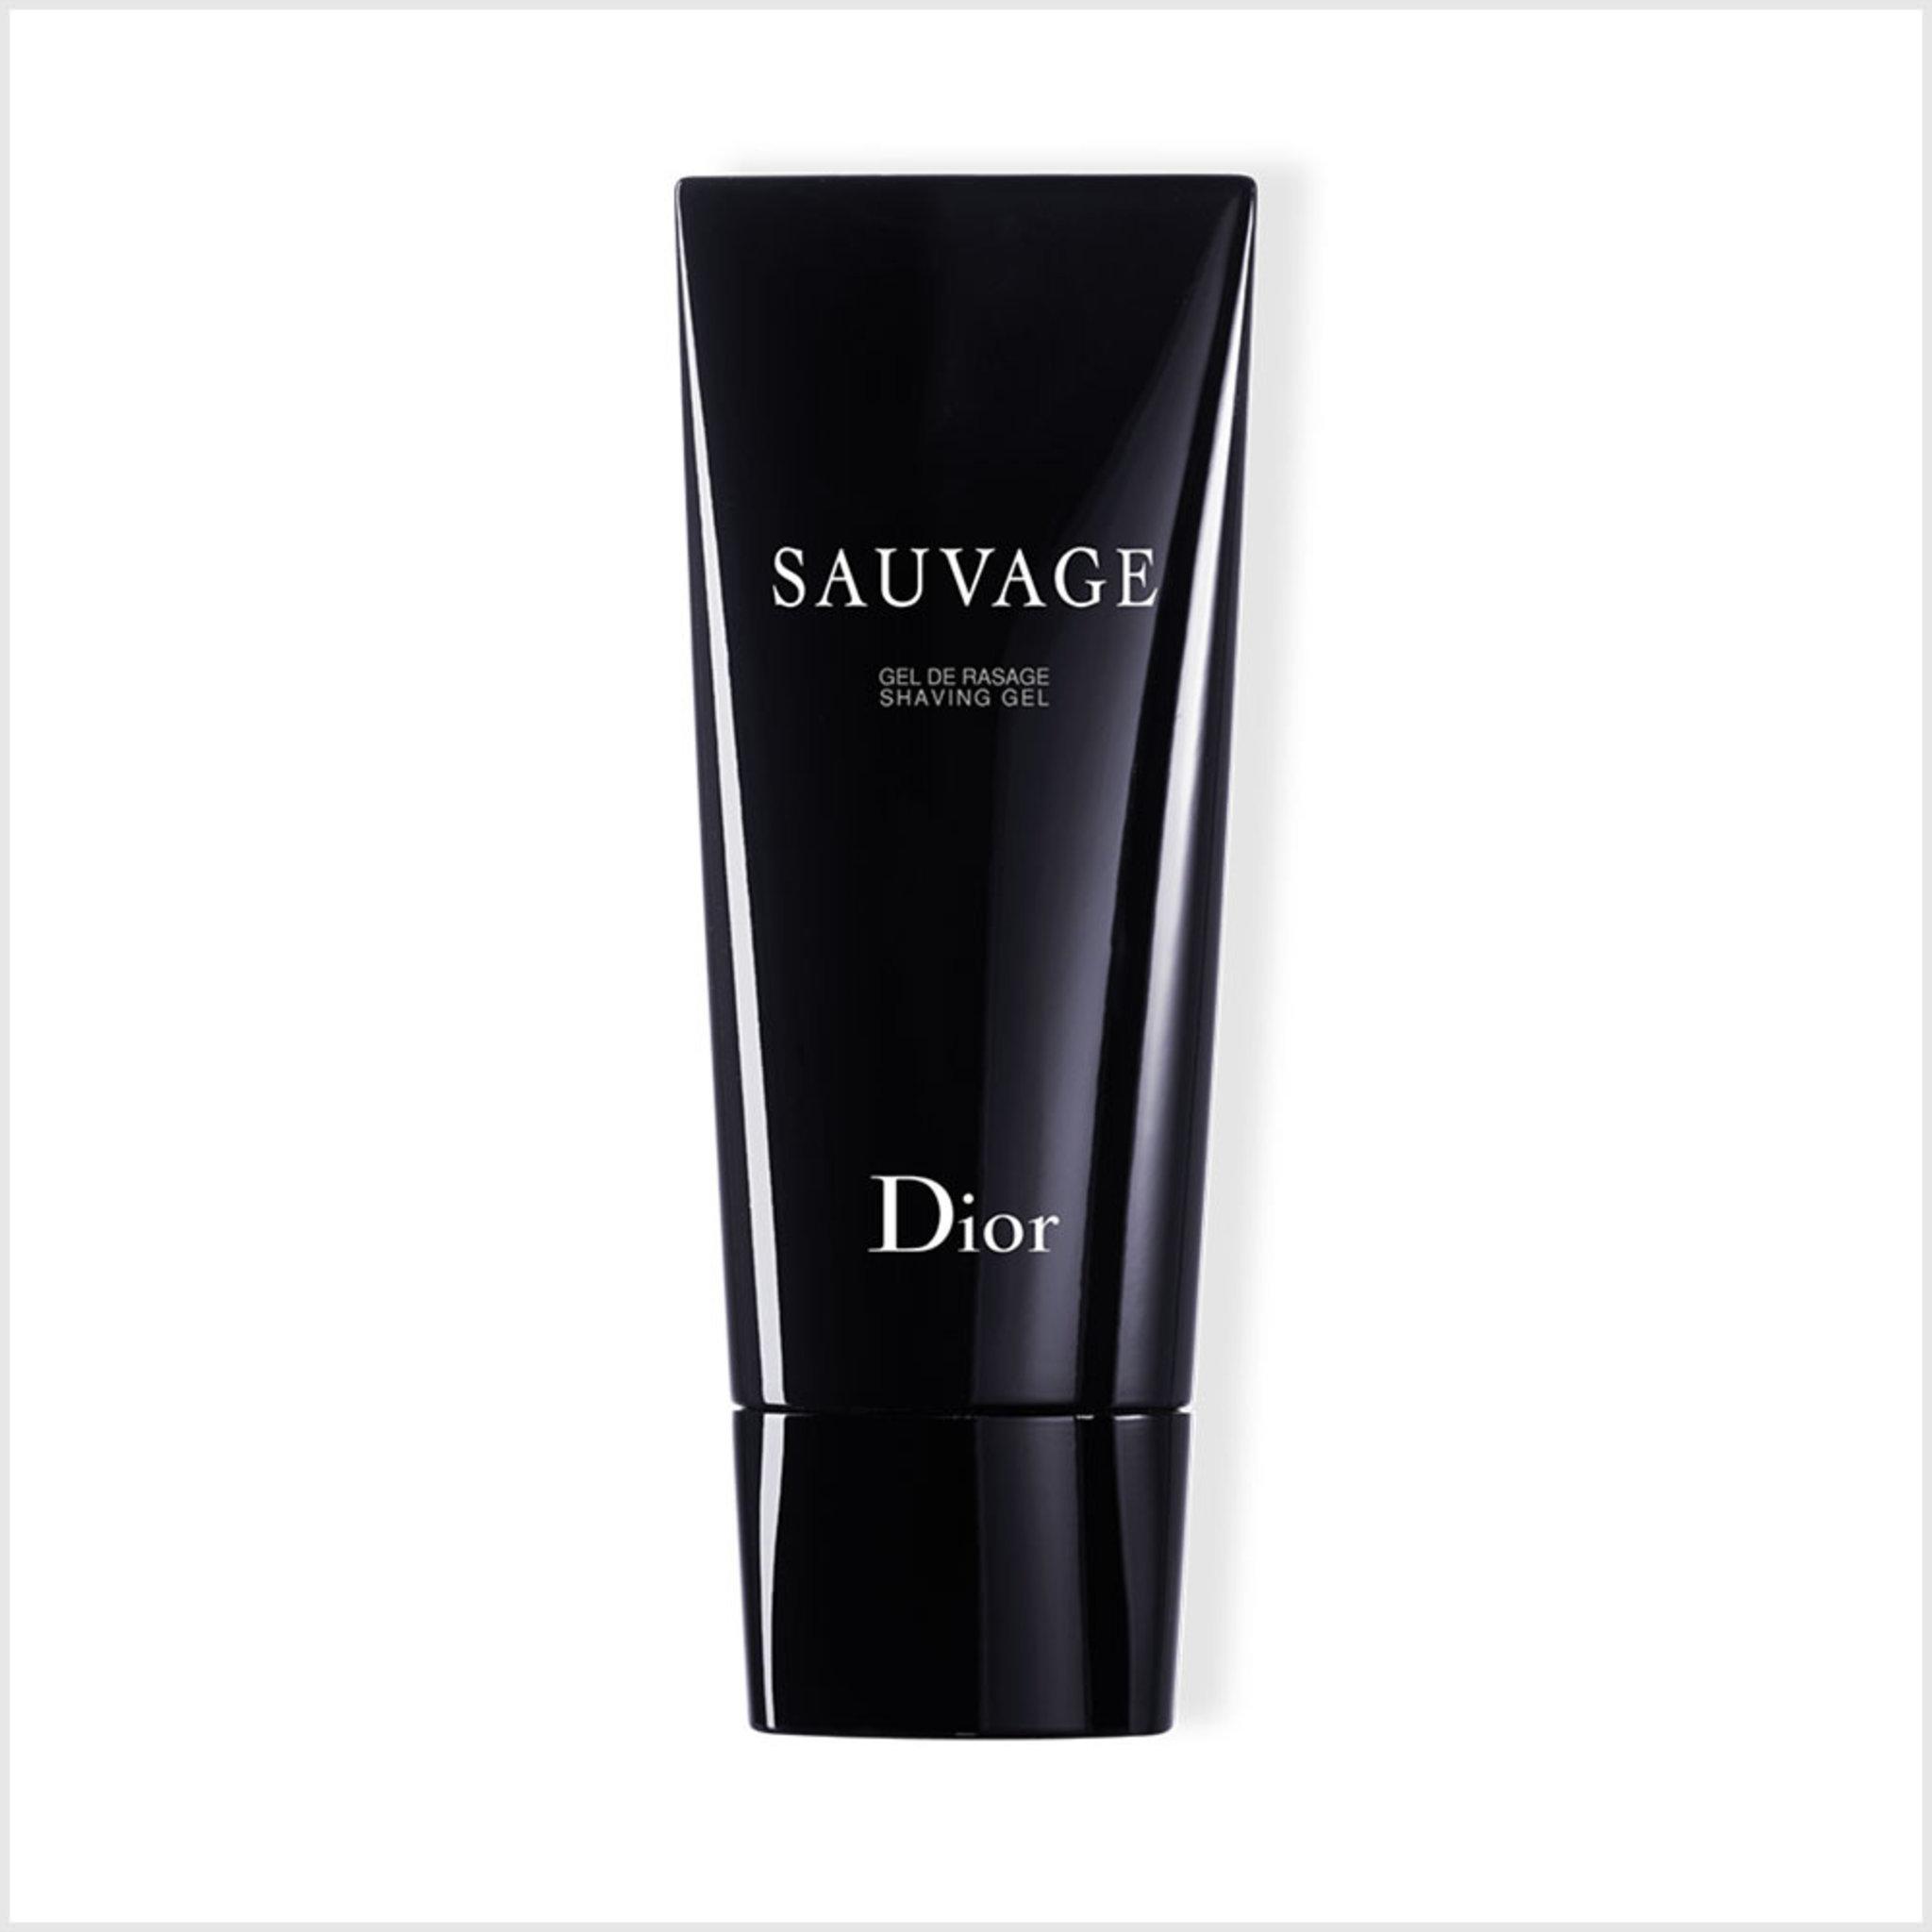 Sauvage Shaving Gel, 125 ml, 125 ML